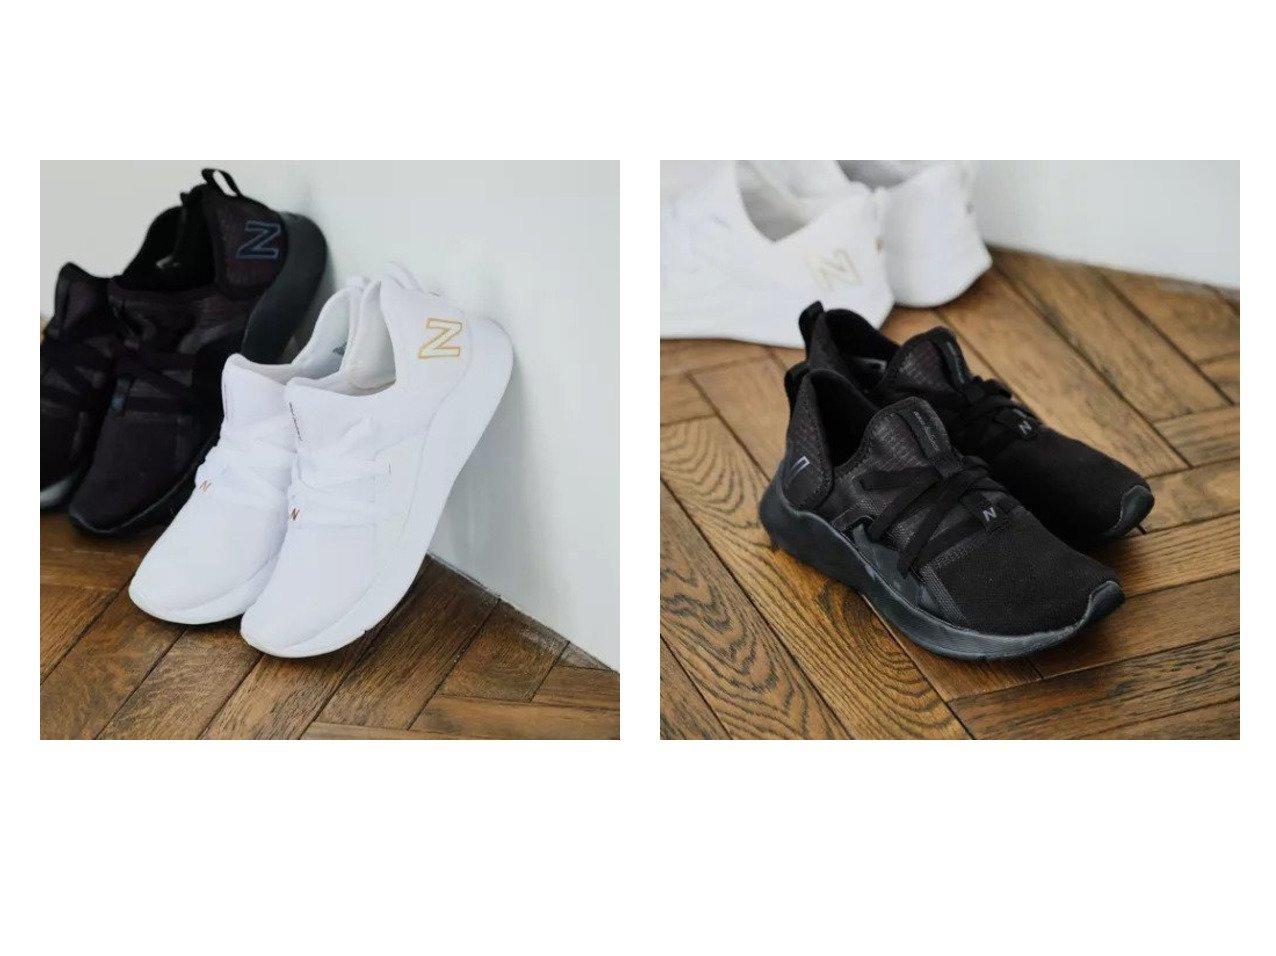 【green label relaxing / UNITED ARROWS/グリーンレーベル リラクシング / ユナイテッドアローズ】の[ ニューバランス ] New Balance SC BEAYA スニーカー 【シューズ・靴】おすすめ!人気トレンド・レディースファッション通販 おすすめで人気の流行・トレンド、ファッションの通販商品 インテリア・家具・メンズファッション・キッズファッション・レディースファッション・服の通販 founy(ファニー) https://founy.com/ ファッション Fashion レディースファッション WOMEN シューズ スタイリッシュ スニーカー スリッポン バランス フィット |ID:crp329100000051523